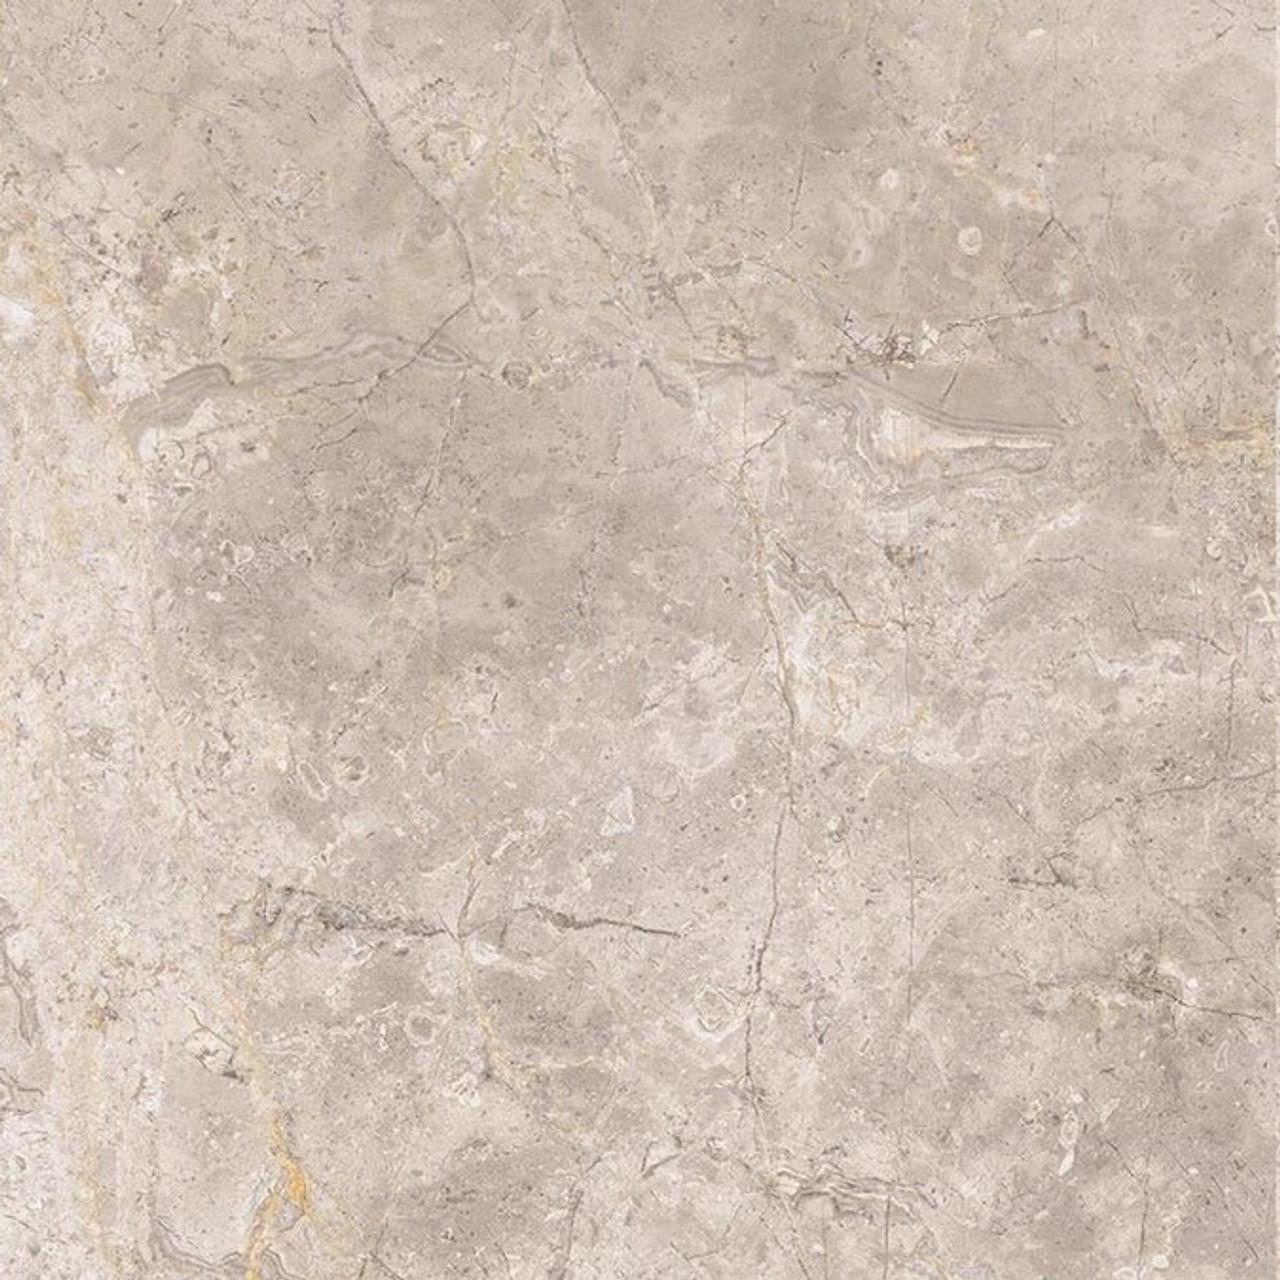 chelsea cafe 12x12 porcelain tile 1st quality 13 56 sf box